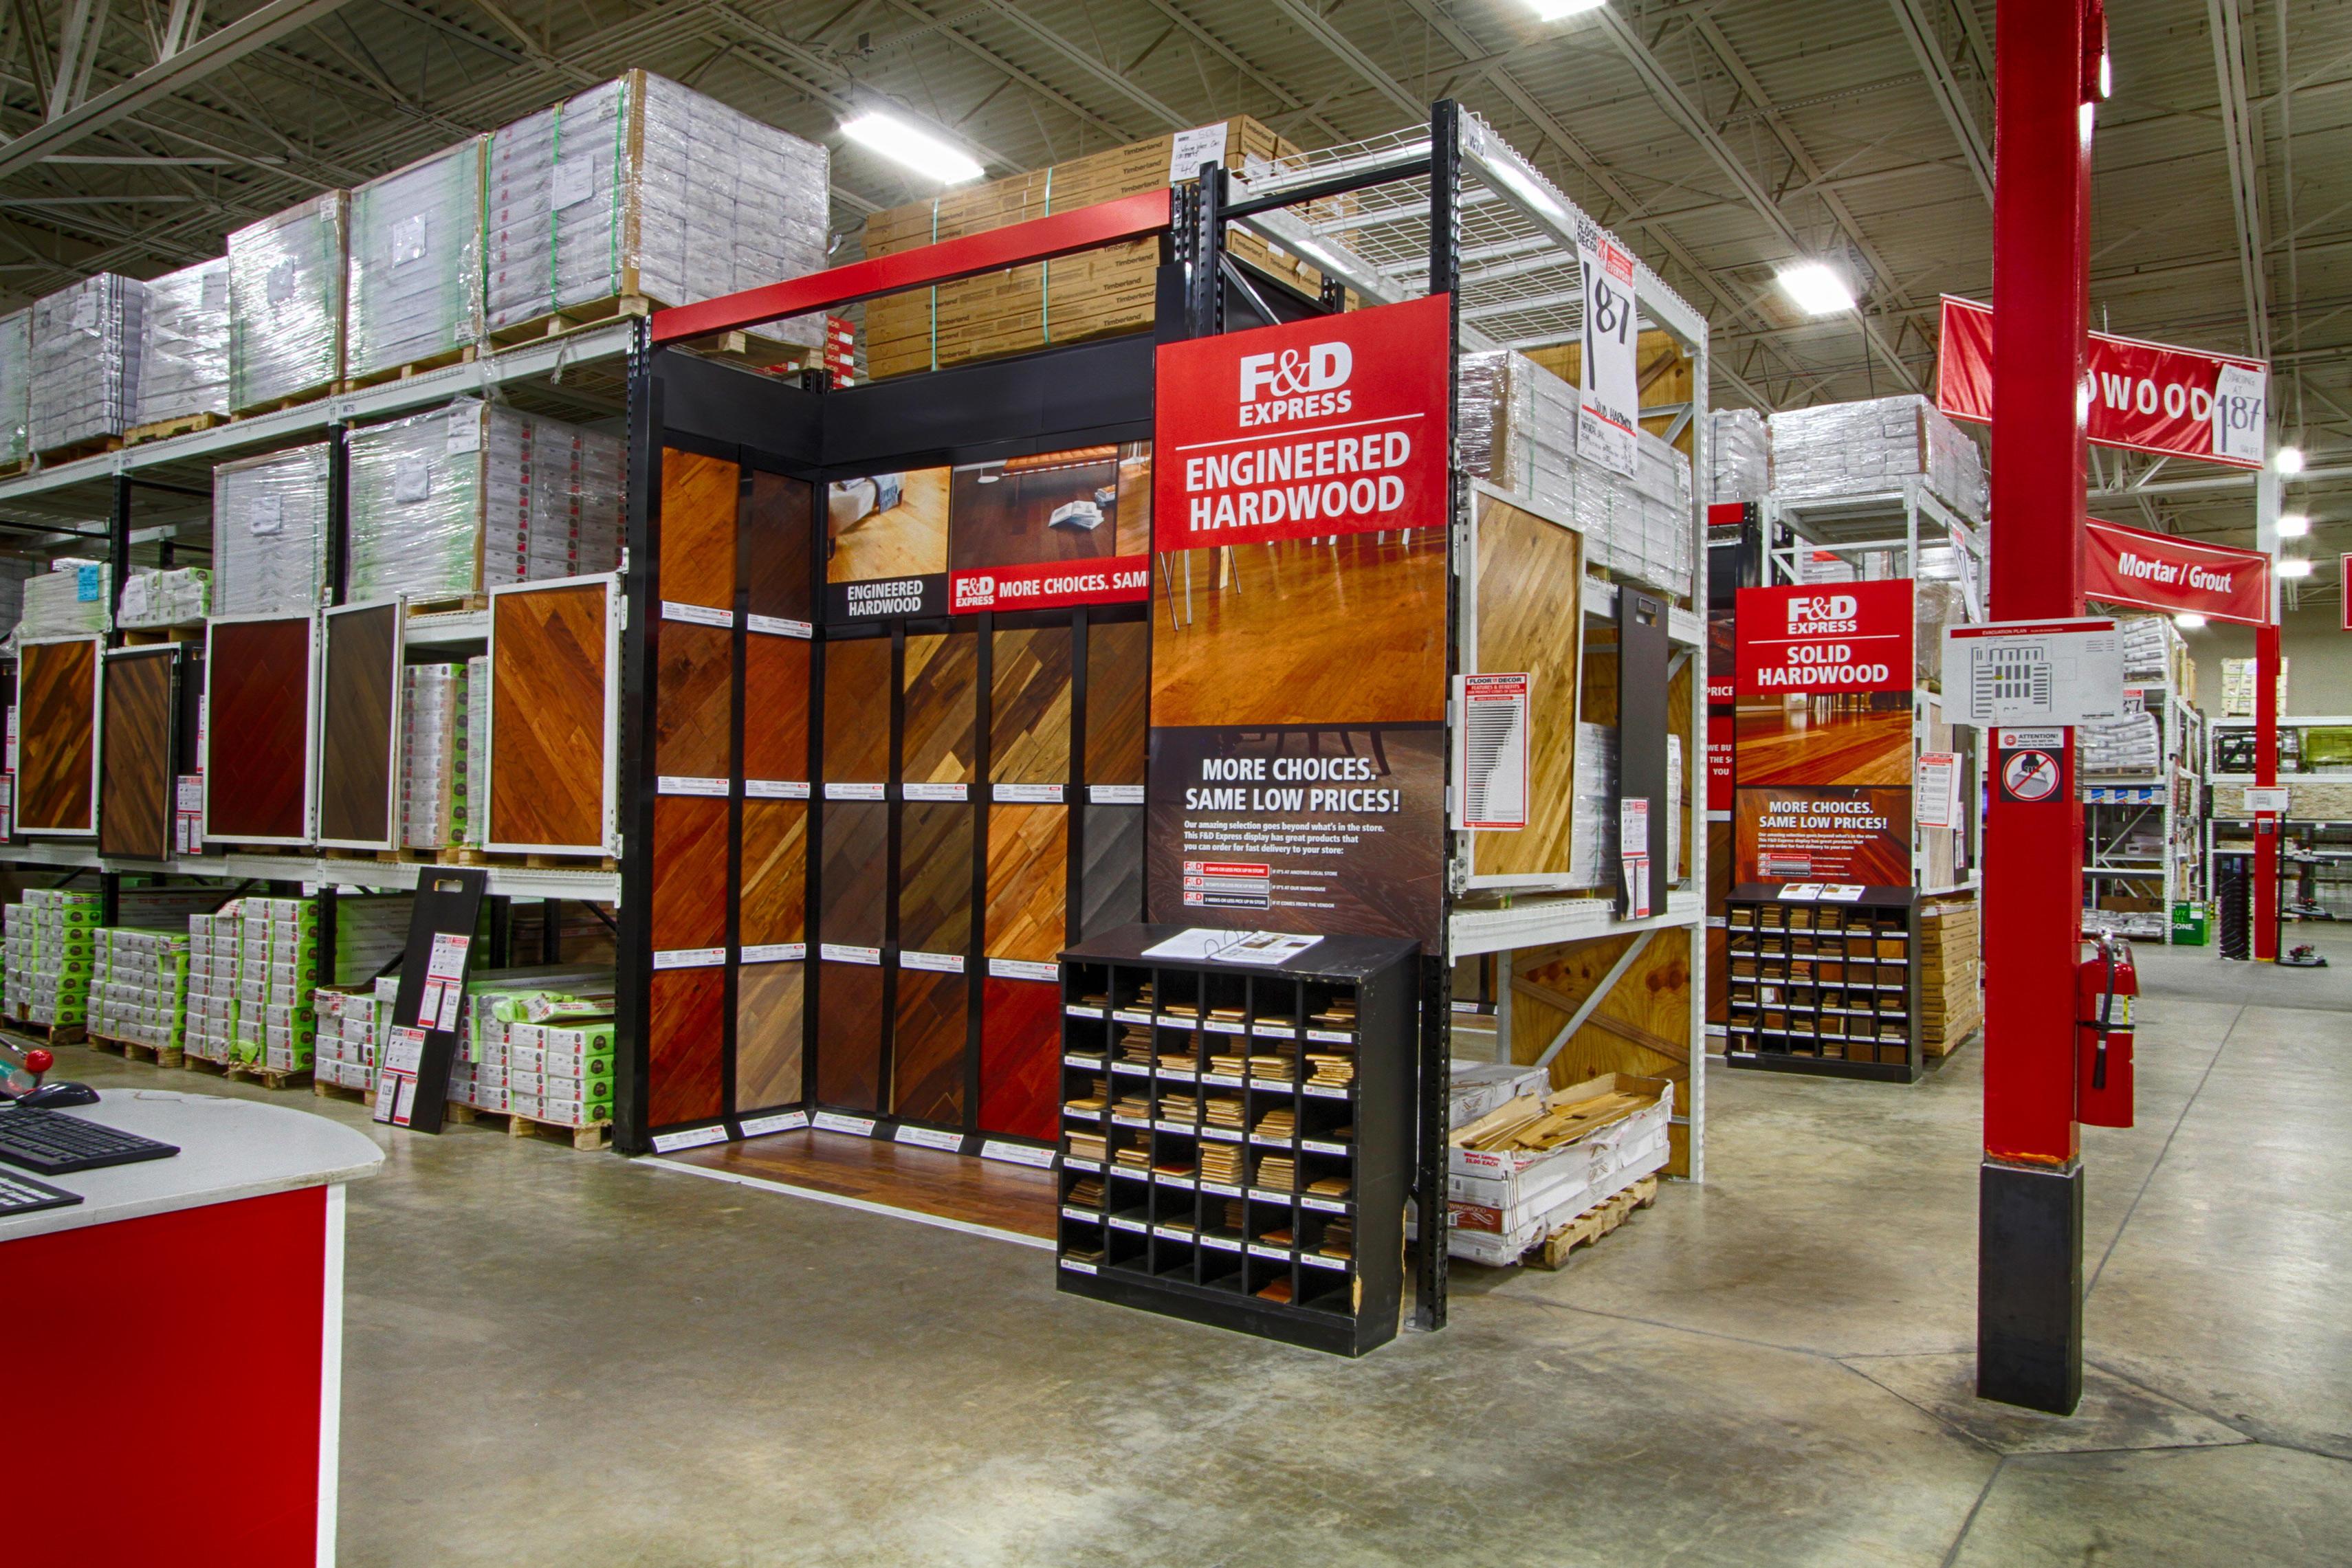 Floor Decor In Tampa Fl 813 426 0